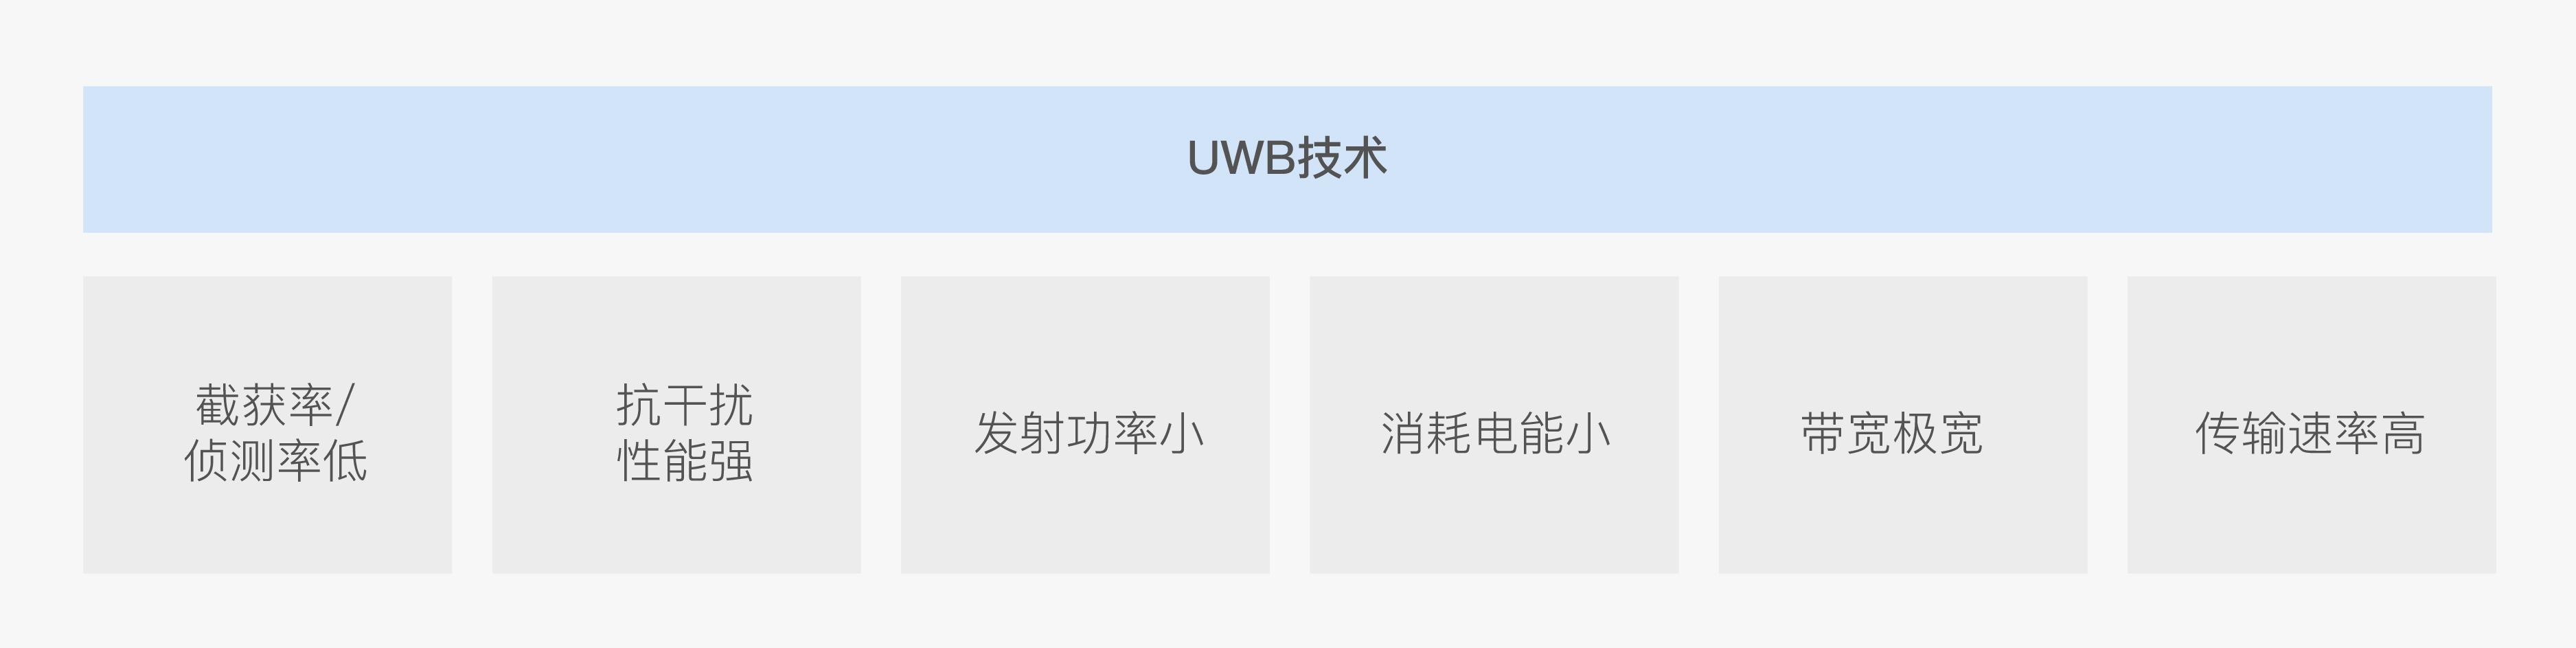 UWB定位技术